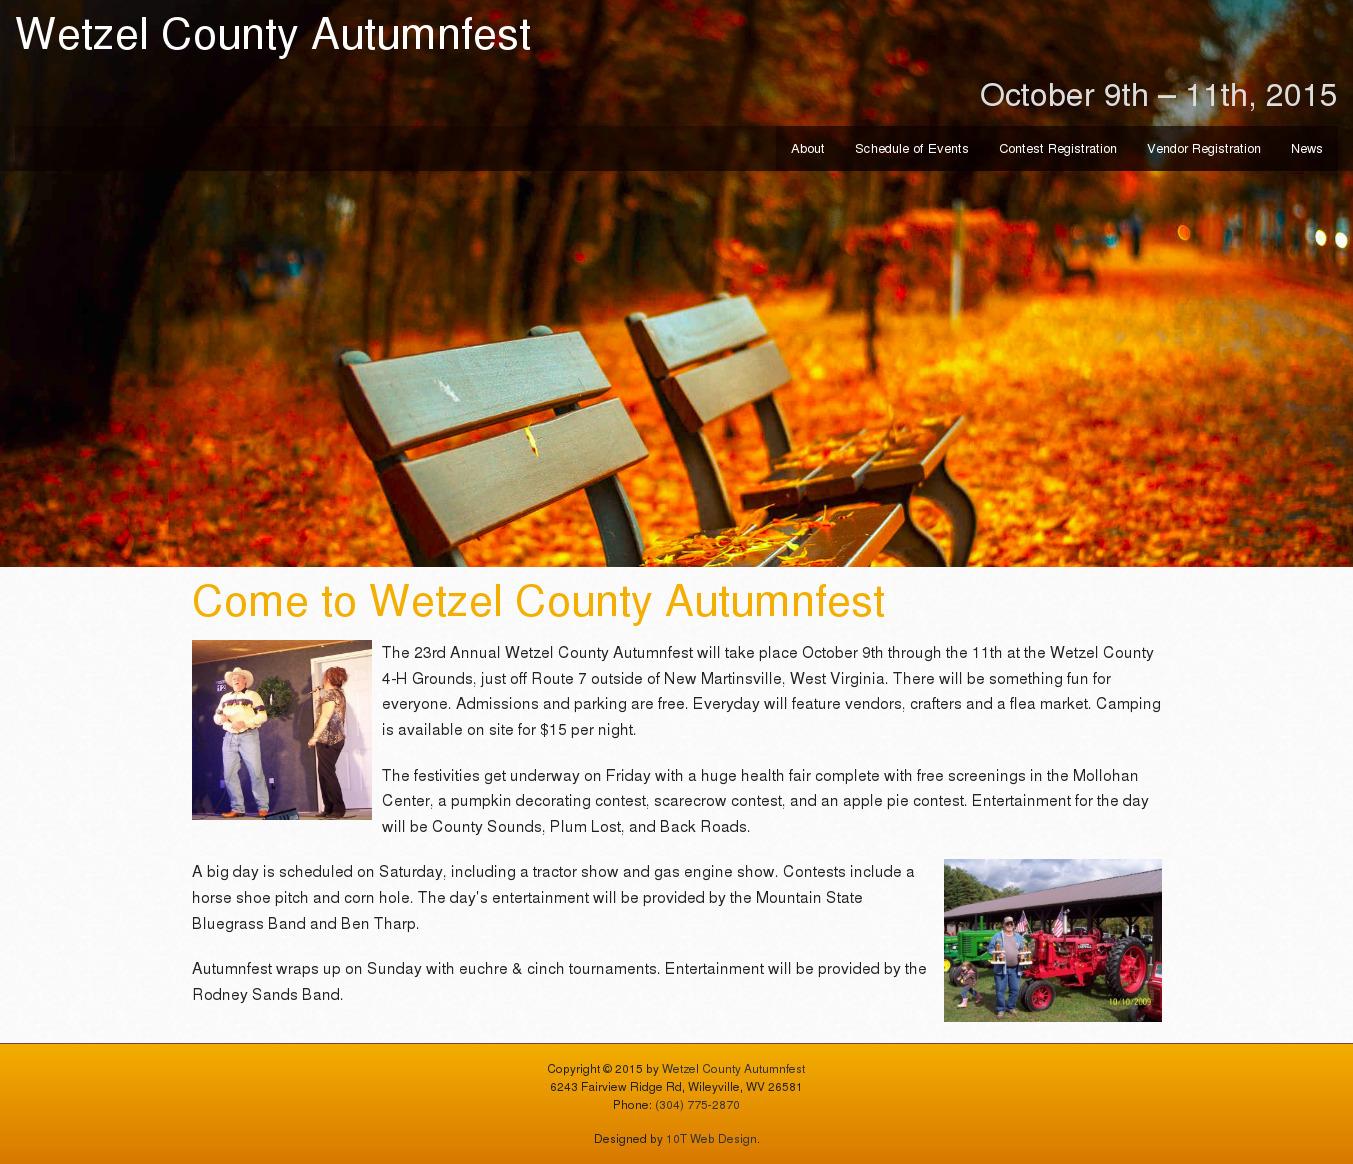 Wetzel County Autumnfest